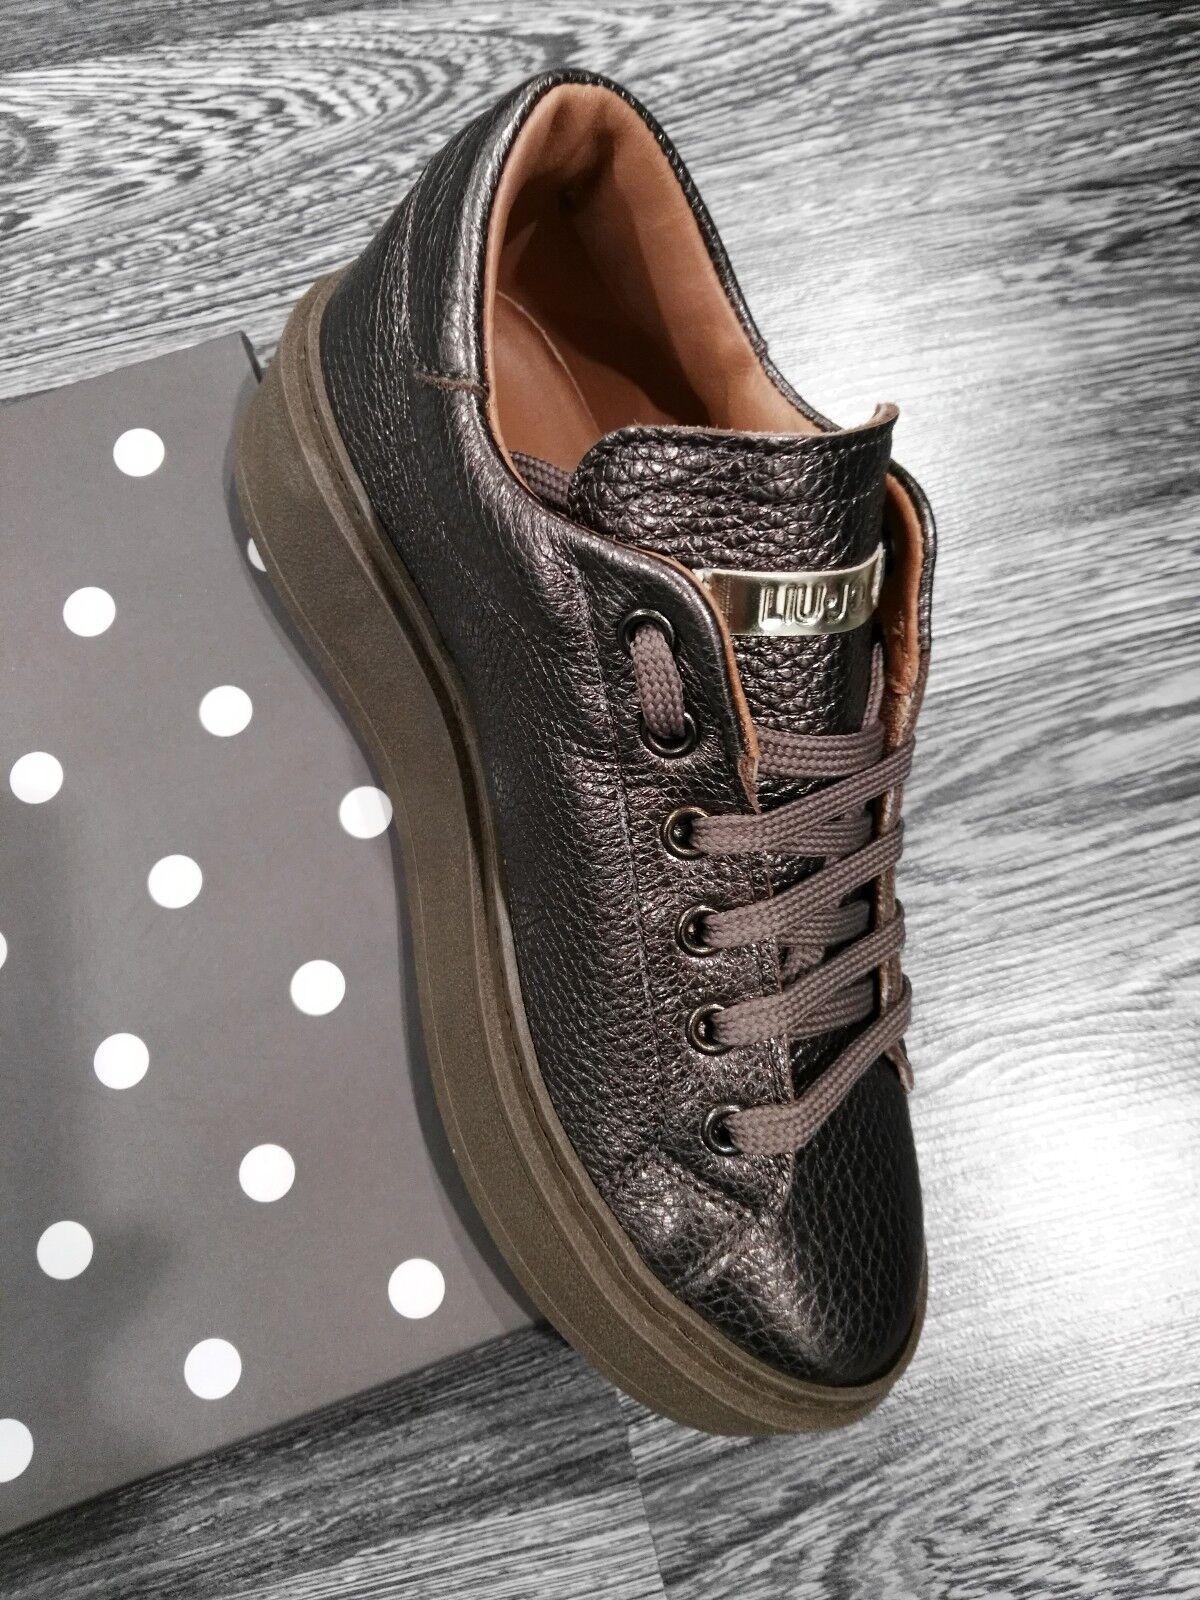 LIU JO,Sneakers JO,Sneakers JO,Sneakers Echtleder ,Bronze, farbe,RABATT 20%,Sohle Gummi,FLATFORM. a18442